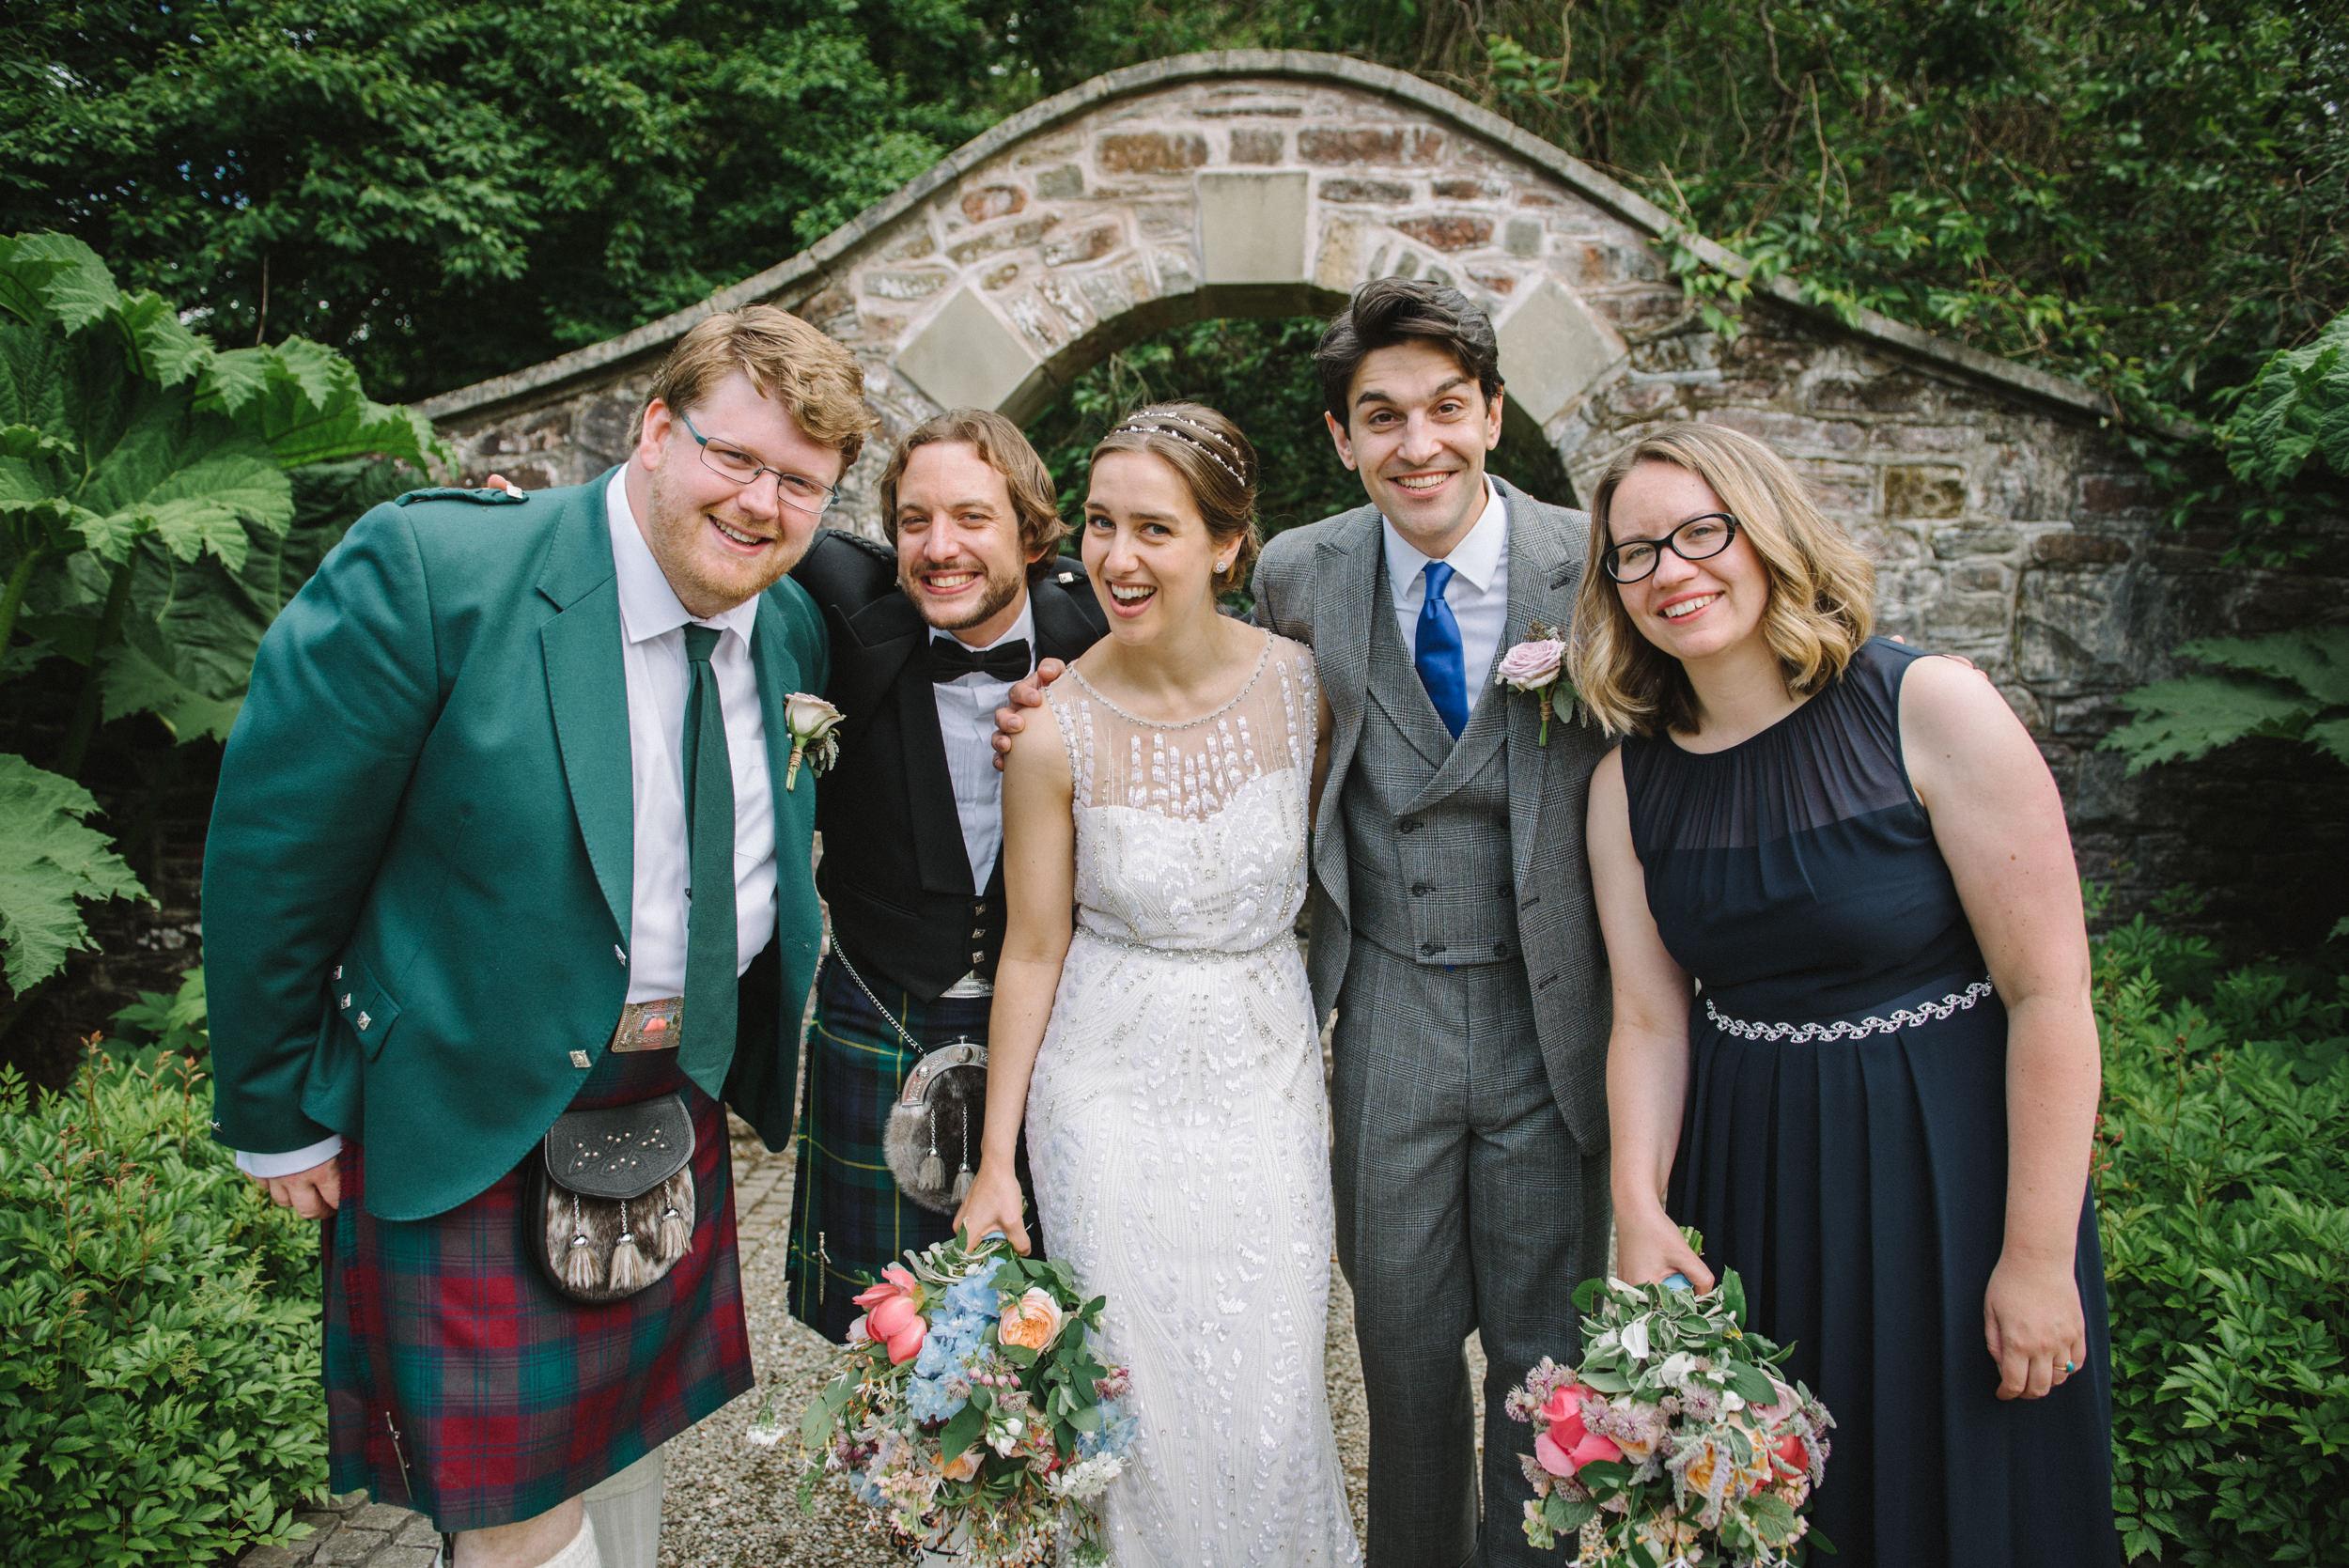 0026-alternative-wedding-portrait-family-kids-photographer-glasgow-scotland.JPG